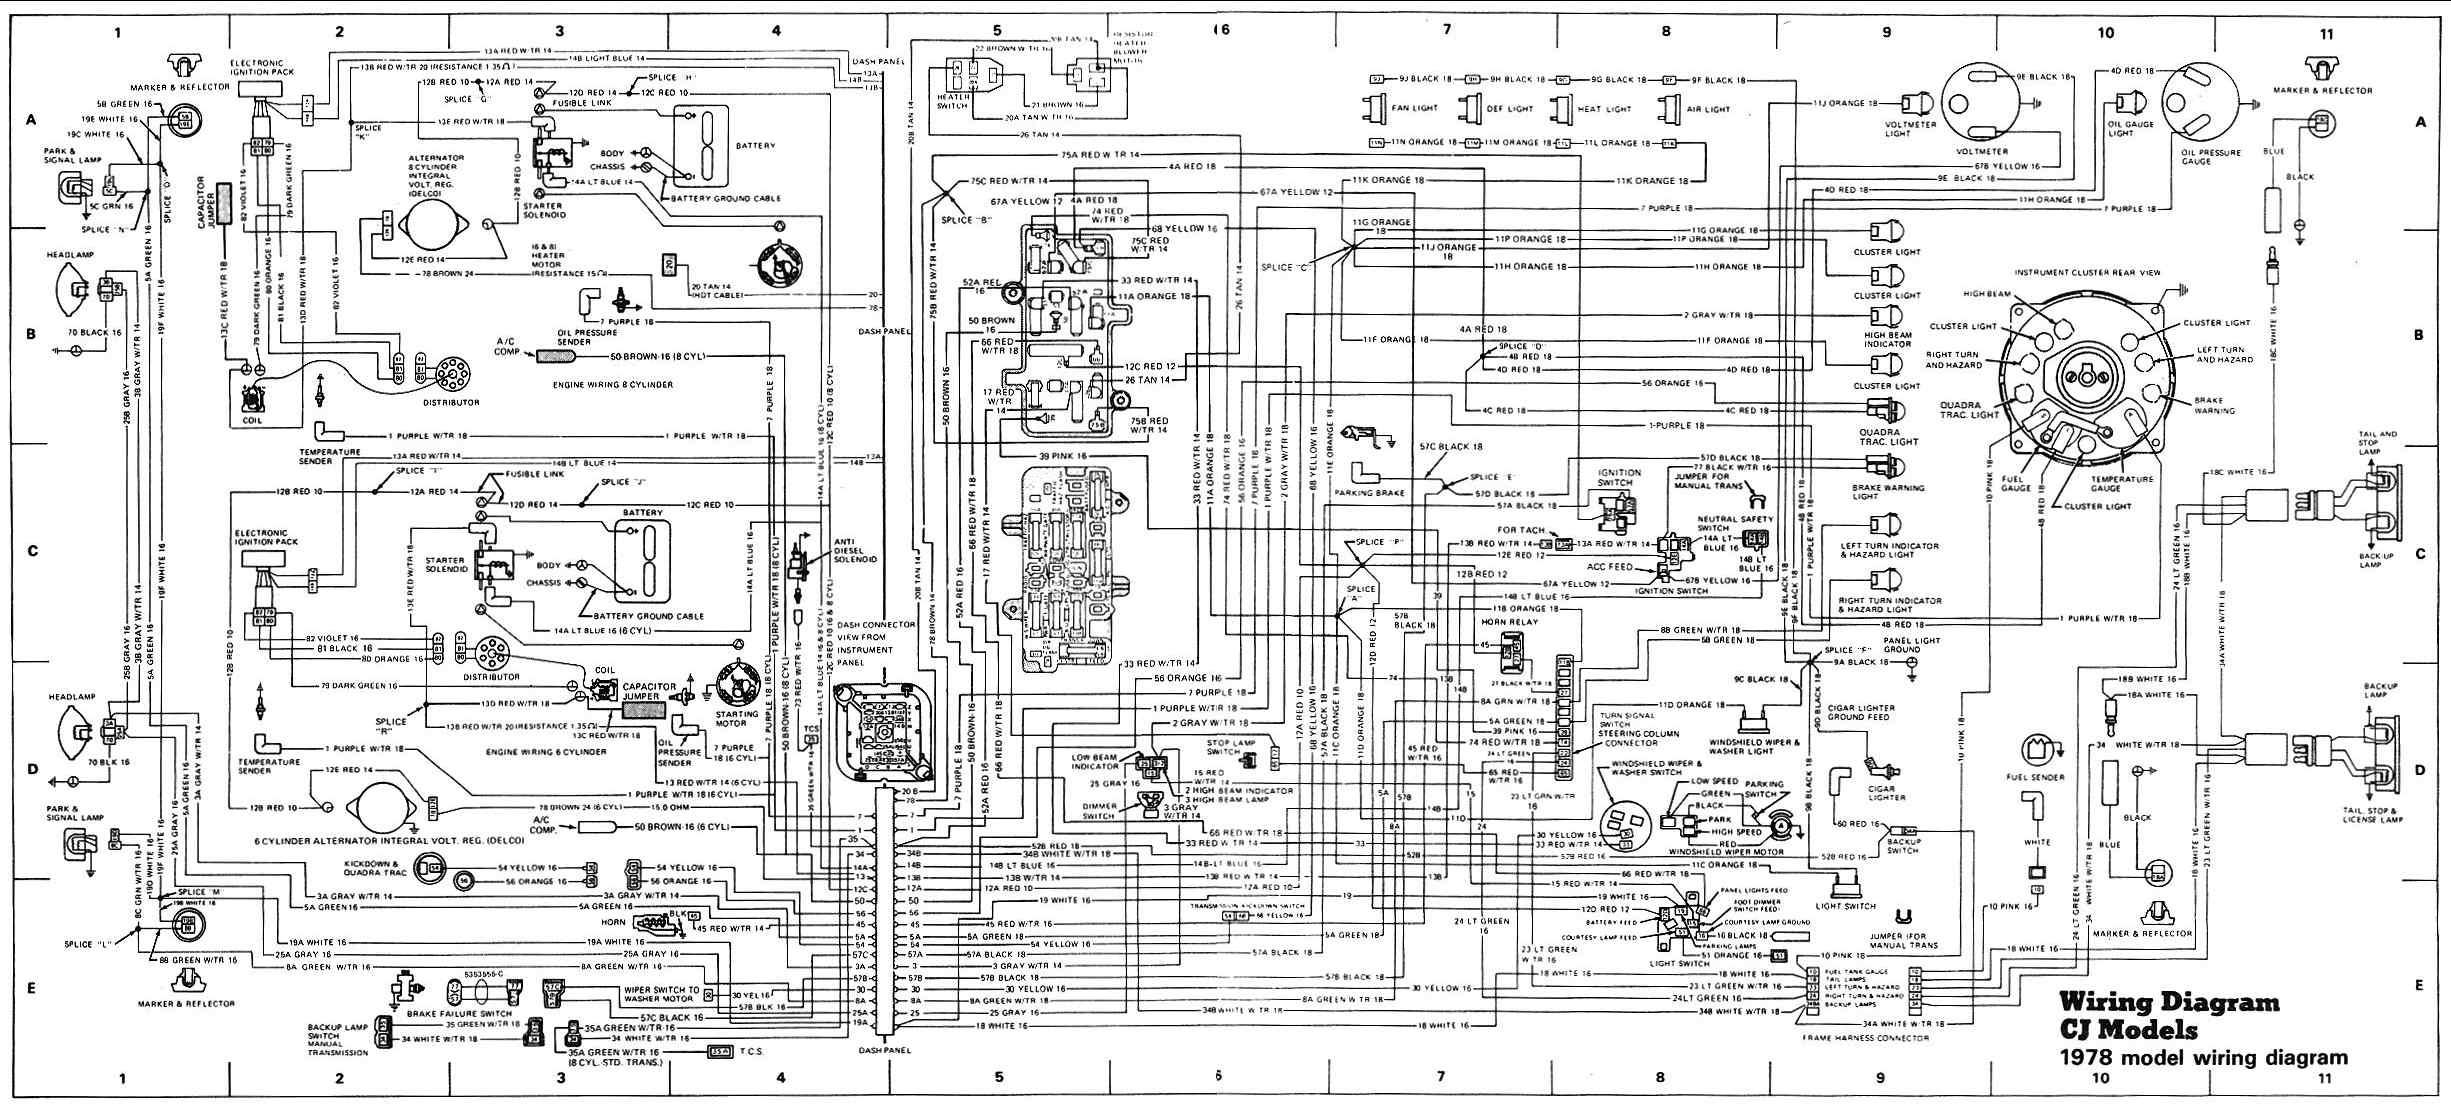 1997 jeep tj fuel pump wiring diagram wiring library rh 33 bloxhuette de 1997 jeep wrangler wiring diagram pcm 1997 jeep wrangler fuse diagram [ 2451 x 1110 Pixel ]